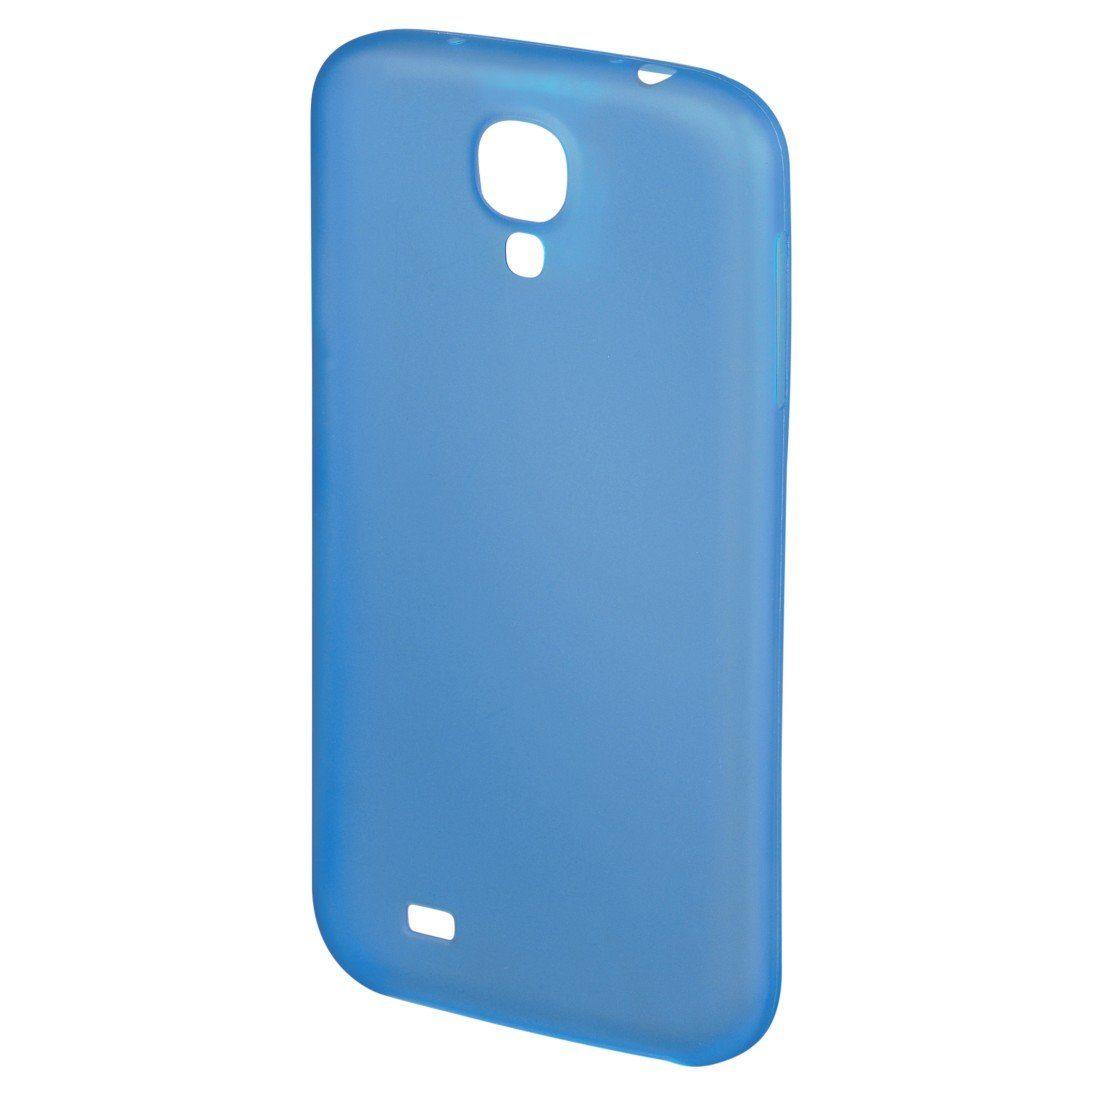 Hama Handy-Cover Ultra Slim für Samsung Galaxy S 4 mini (LTE), Blau